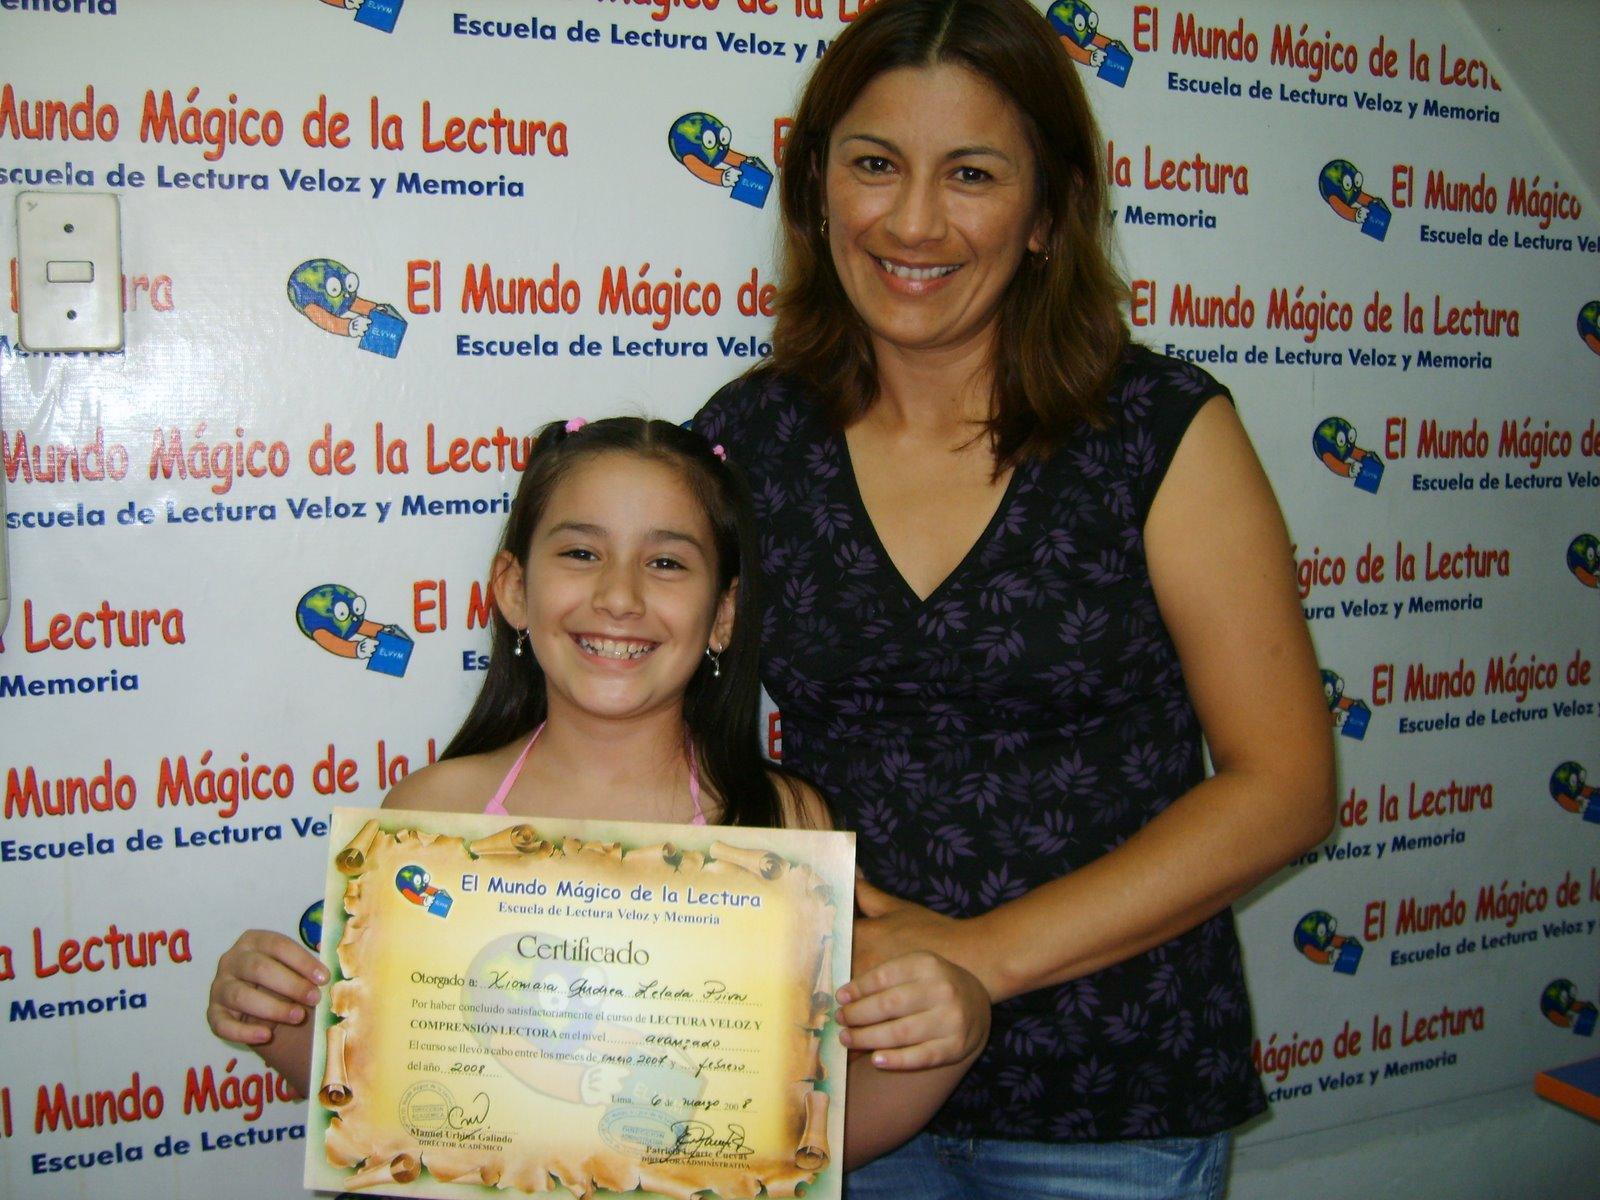 Xiomara Zelada Riva